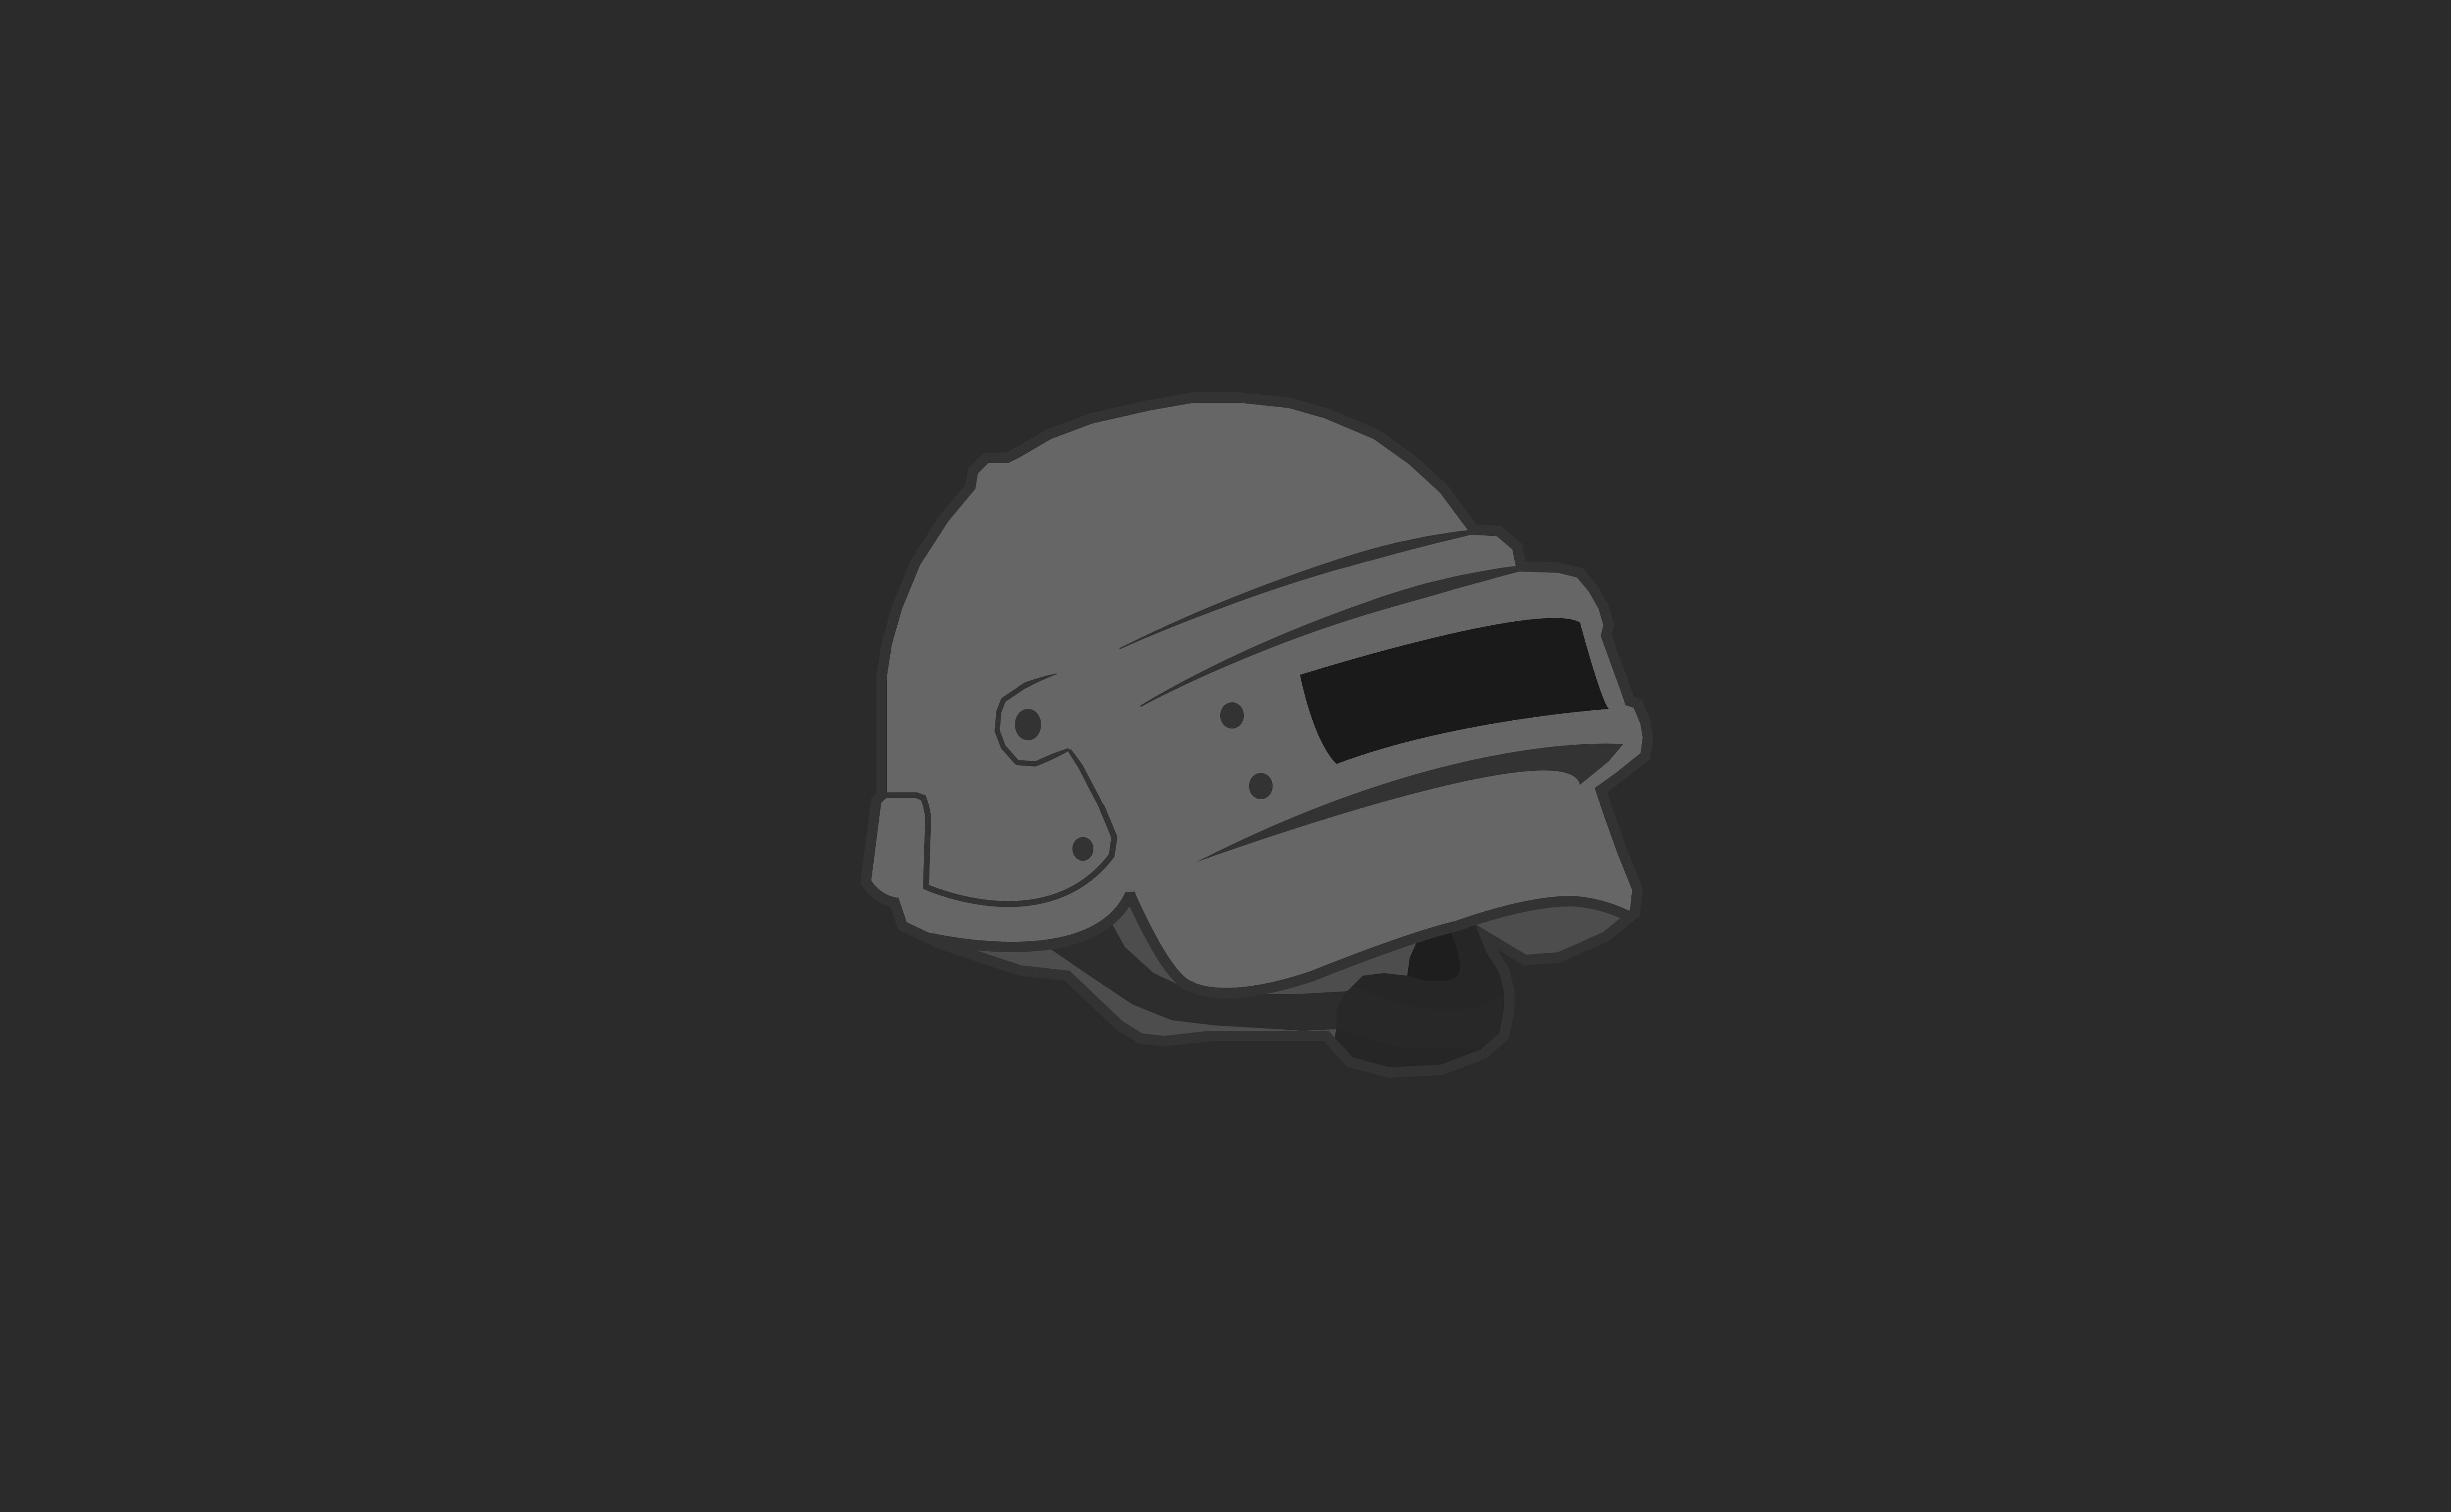 1125x2436 Pubg Helmet Logo 4k Iphone Xs Iphone 10 Iphone X